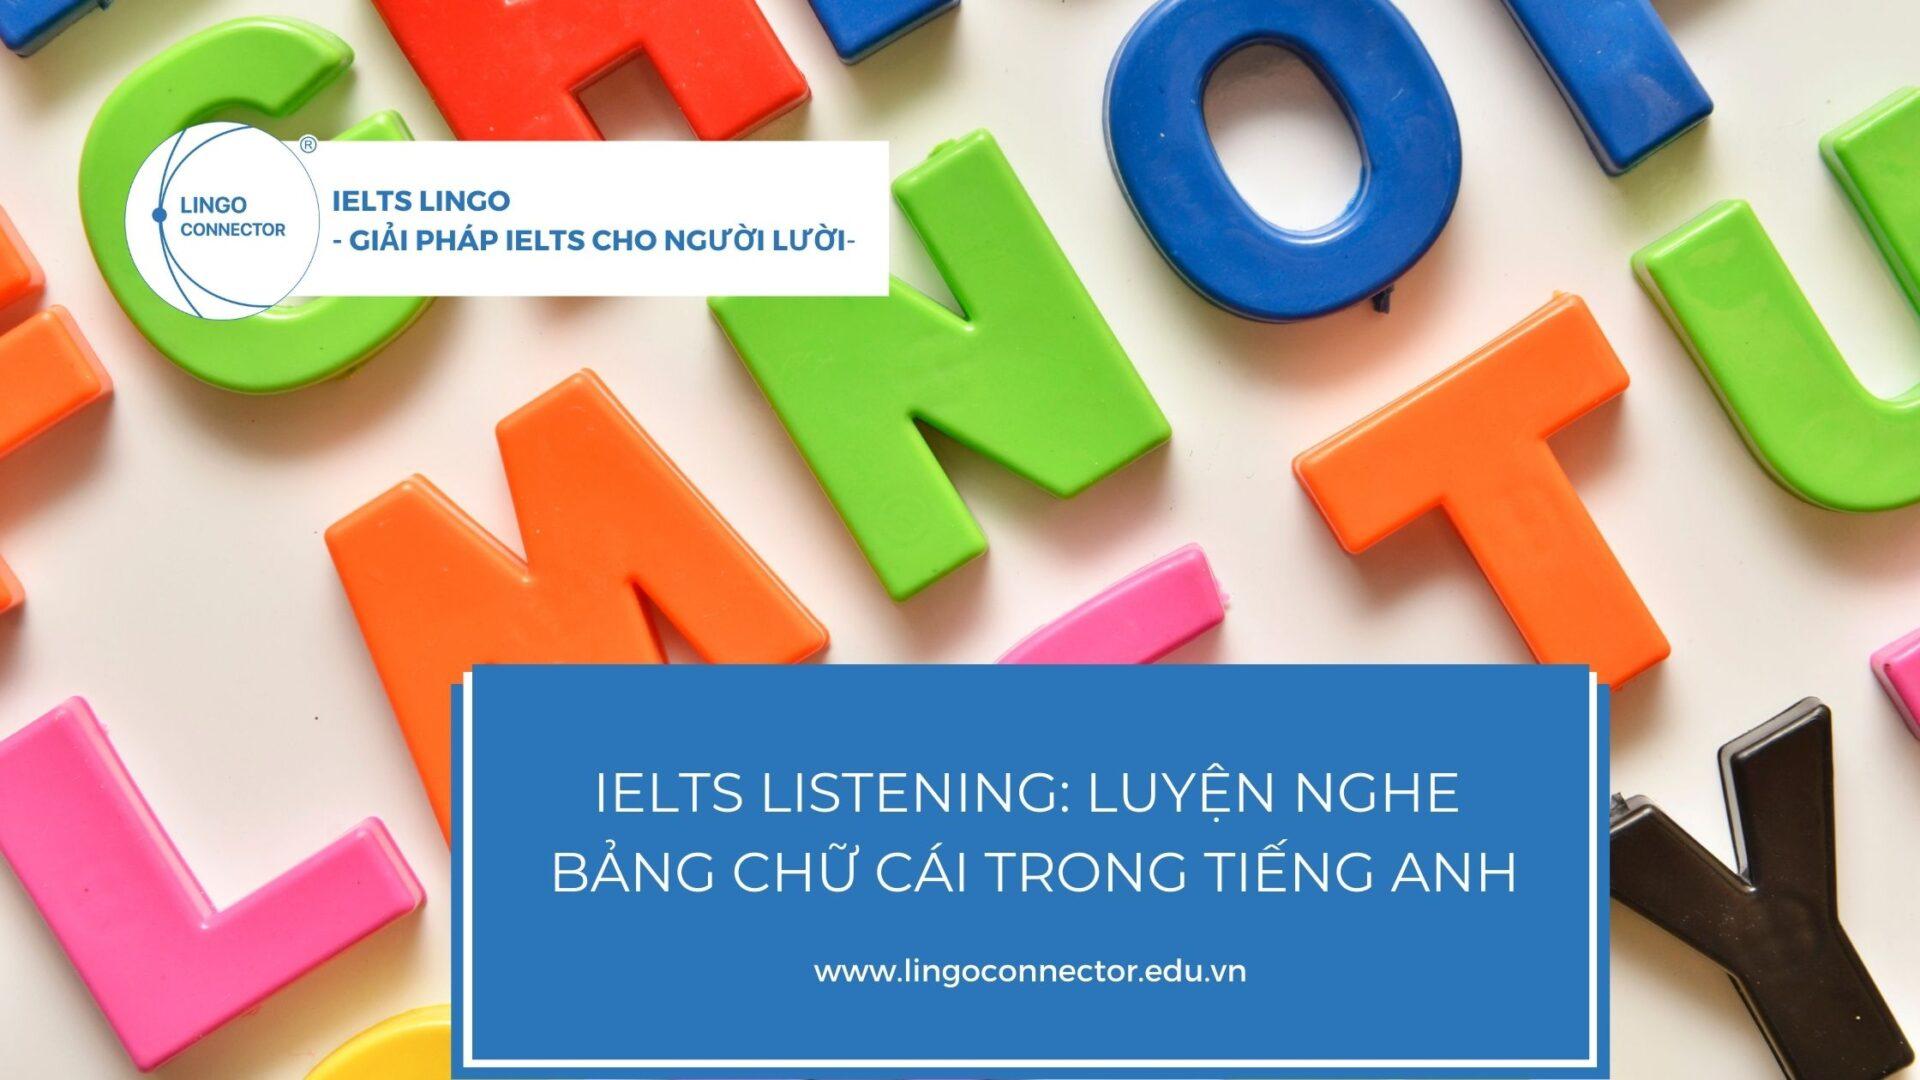 ielts-listening-bang-chu-cai